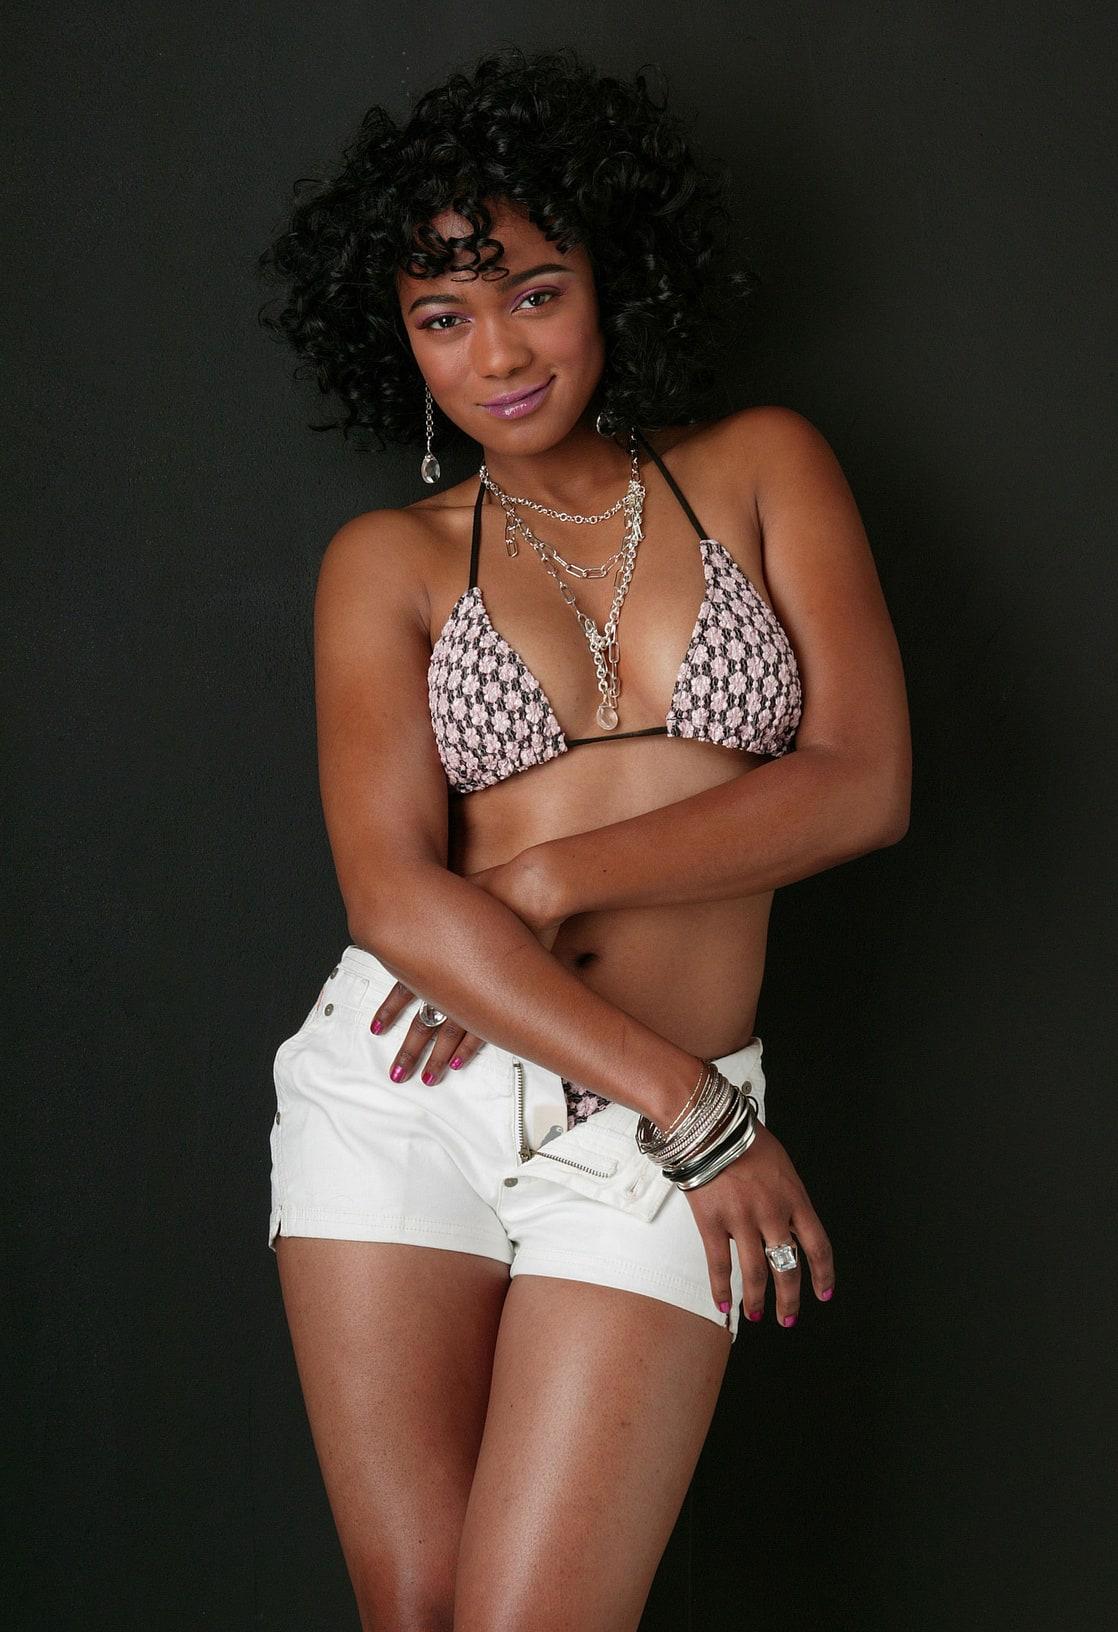 Picture of Tatyana Ali